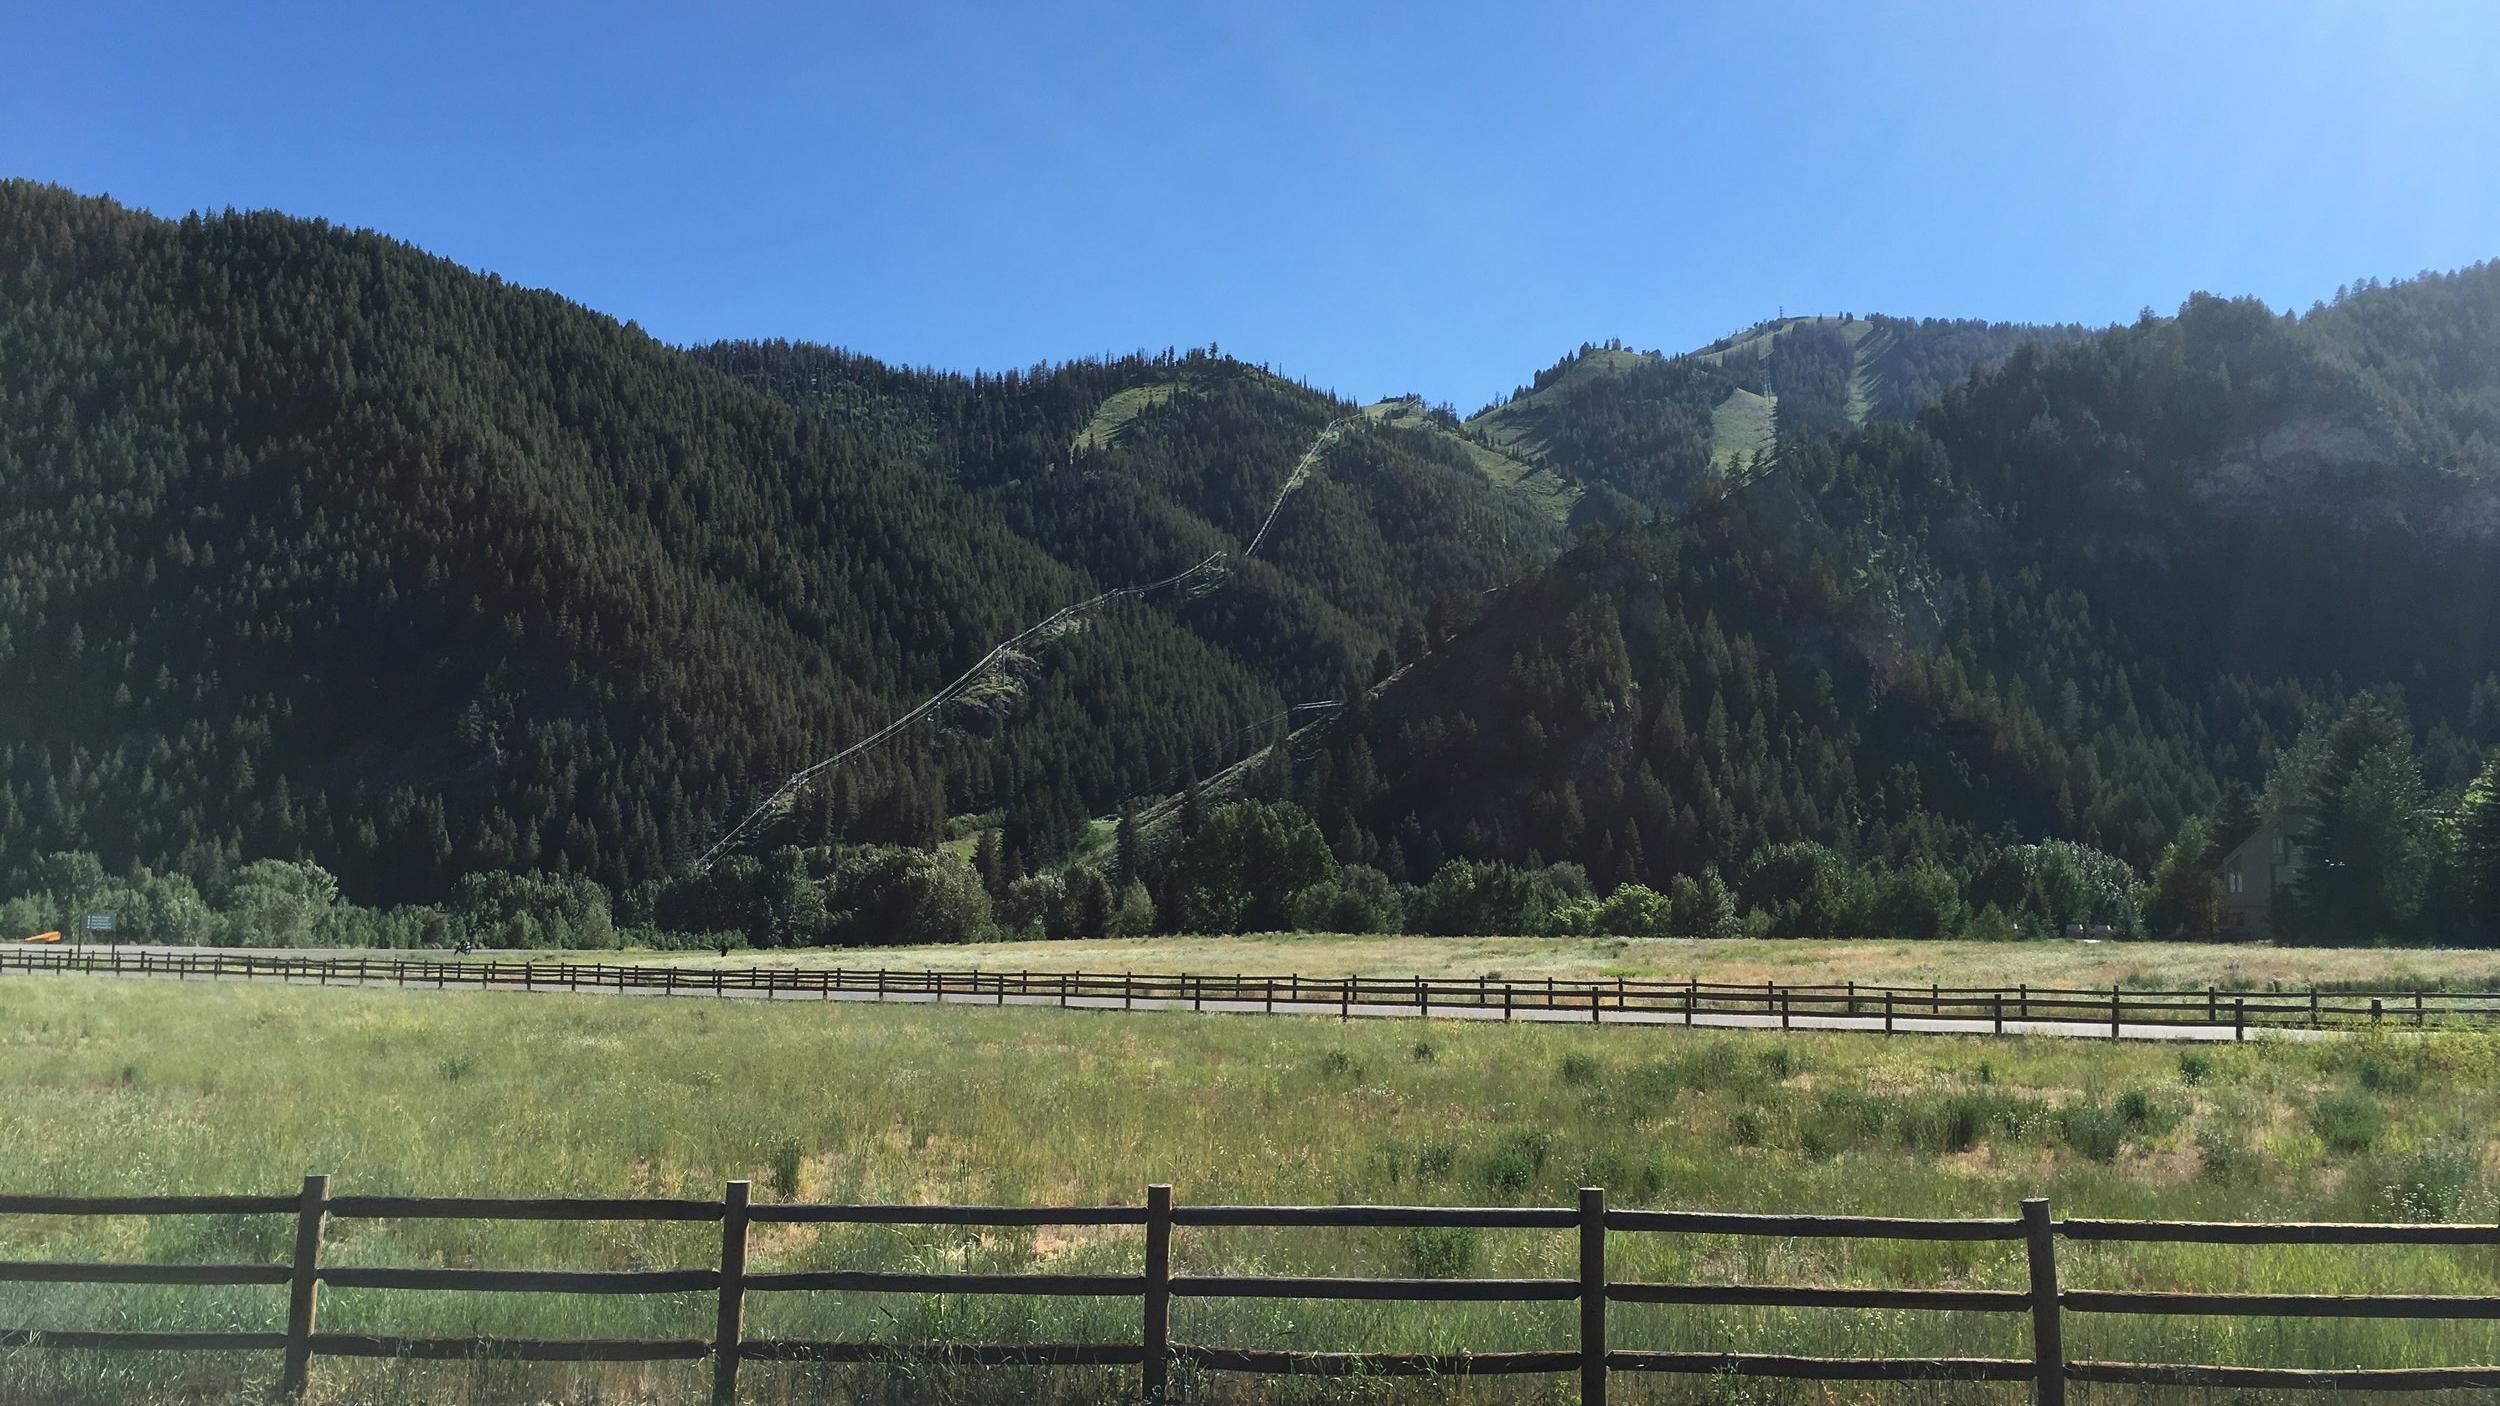 The Meadows | Ketchum, Idaho